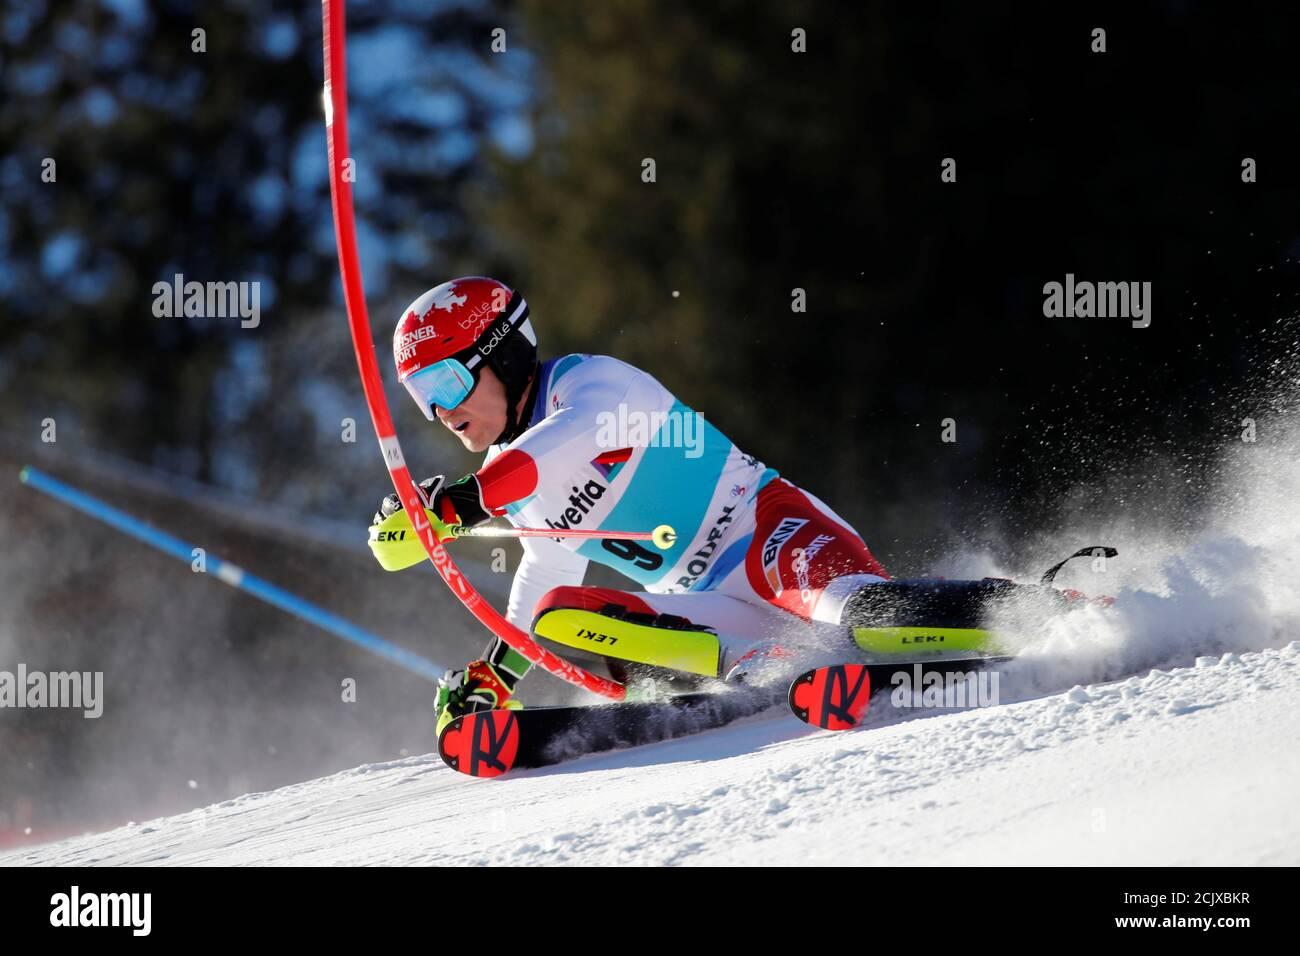 Alpine Skiing Slalom Adelboden Switzerland January 12 2020 Switzerland S Loic Meillard In Action Reuters Stefan Wermuth Stock Photo Alamy